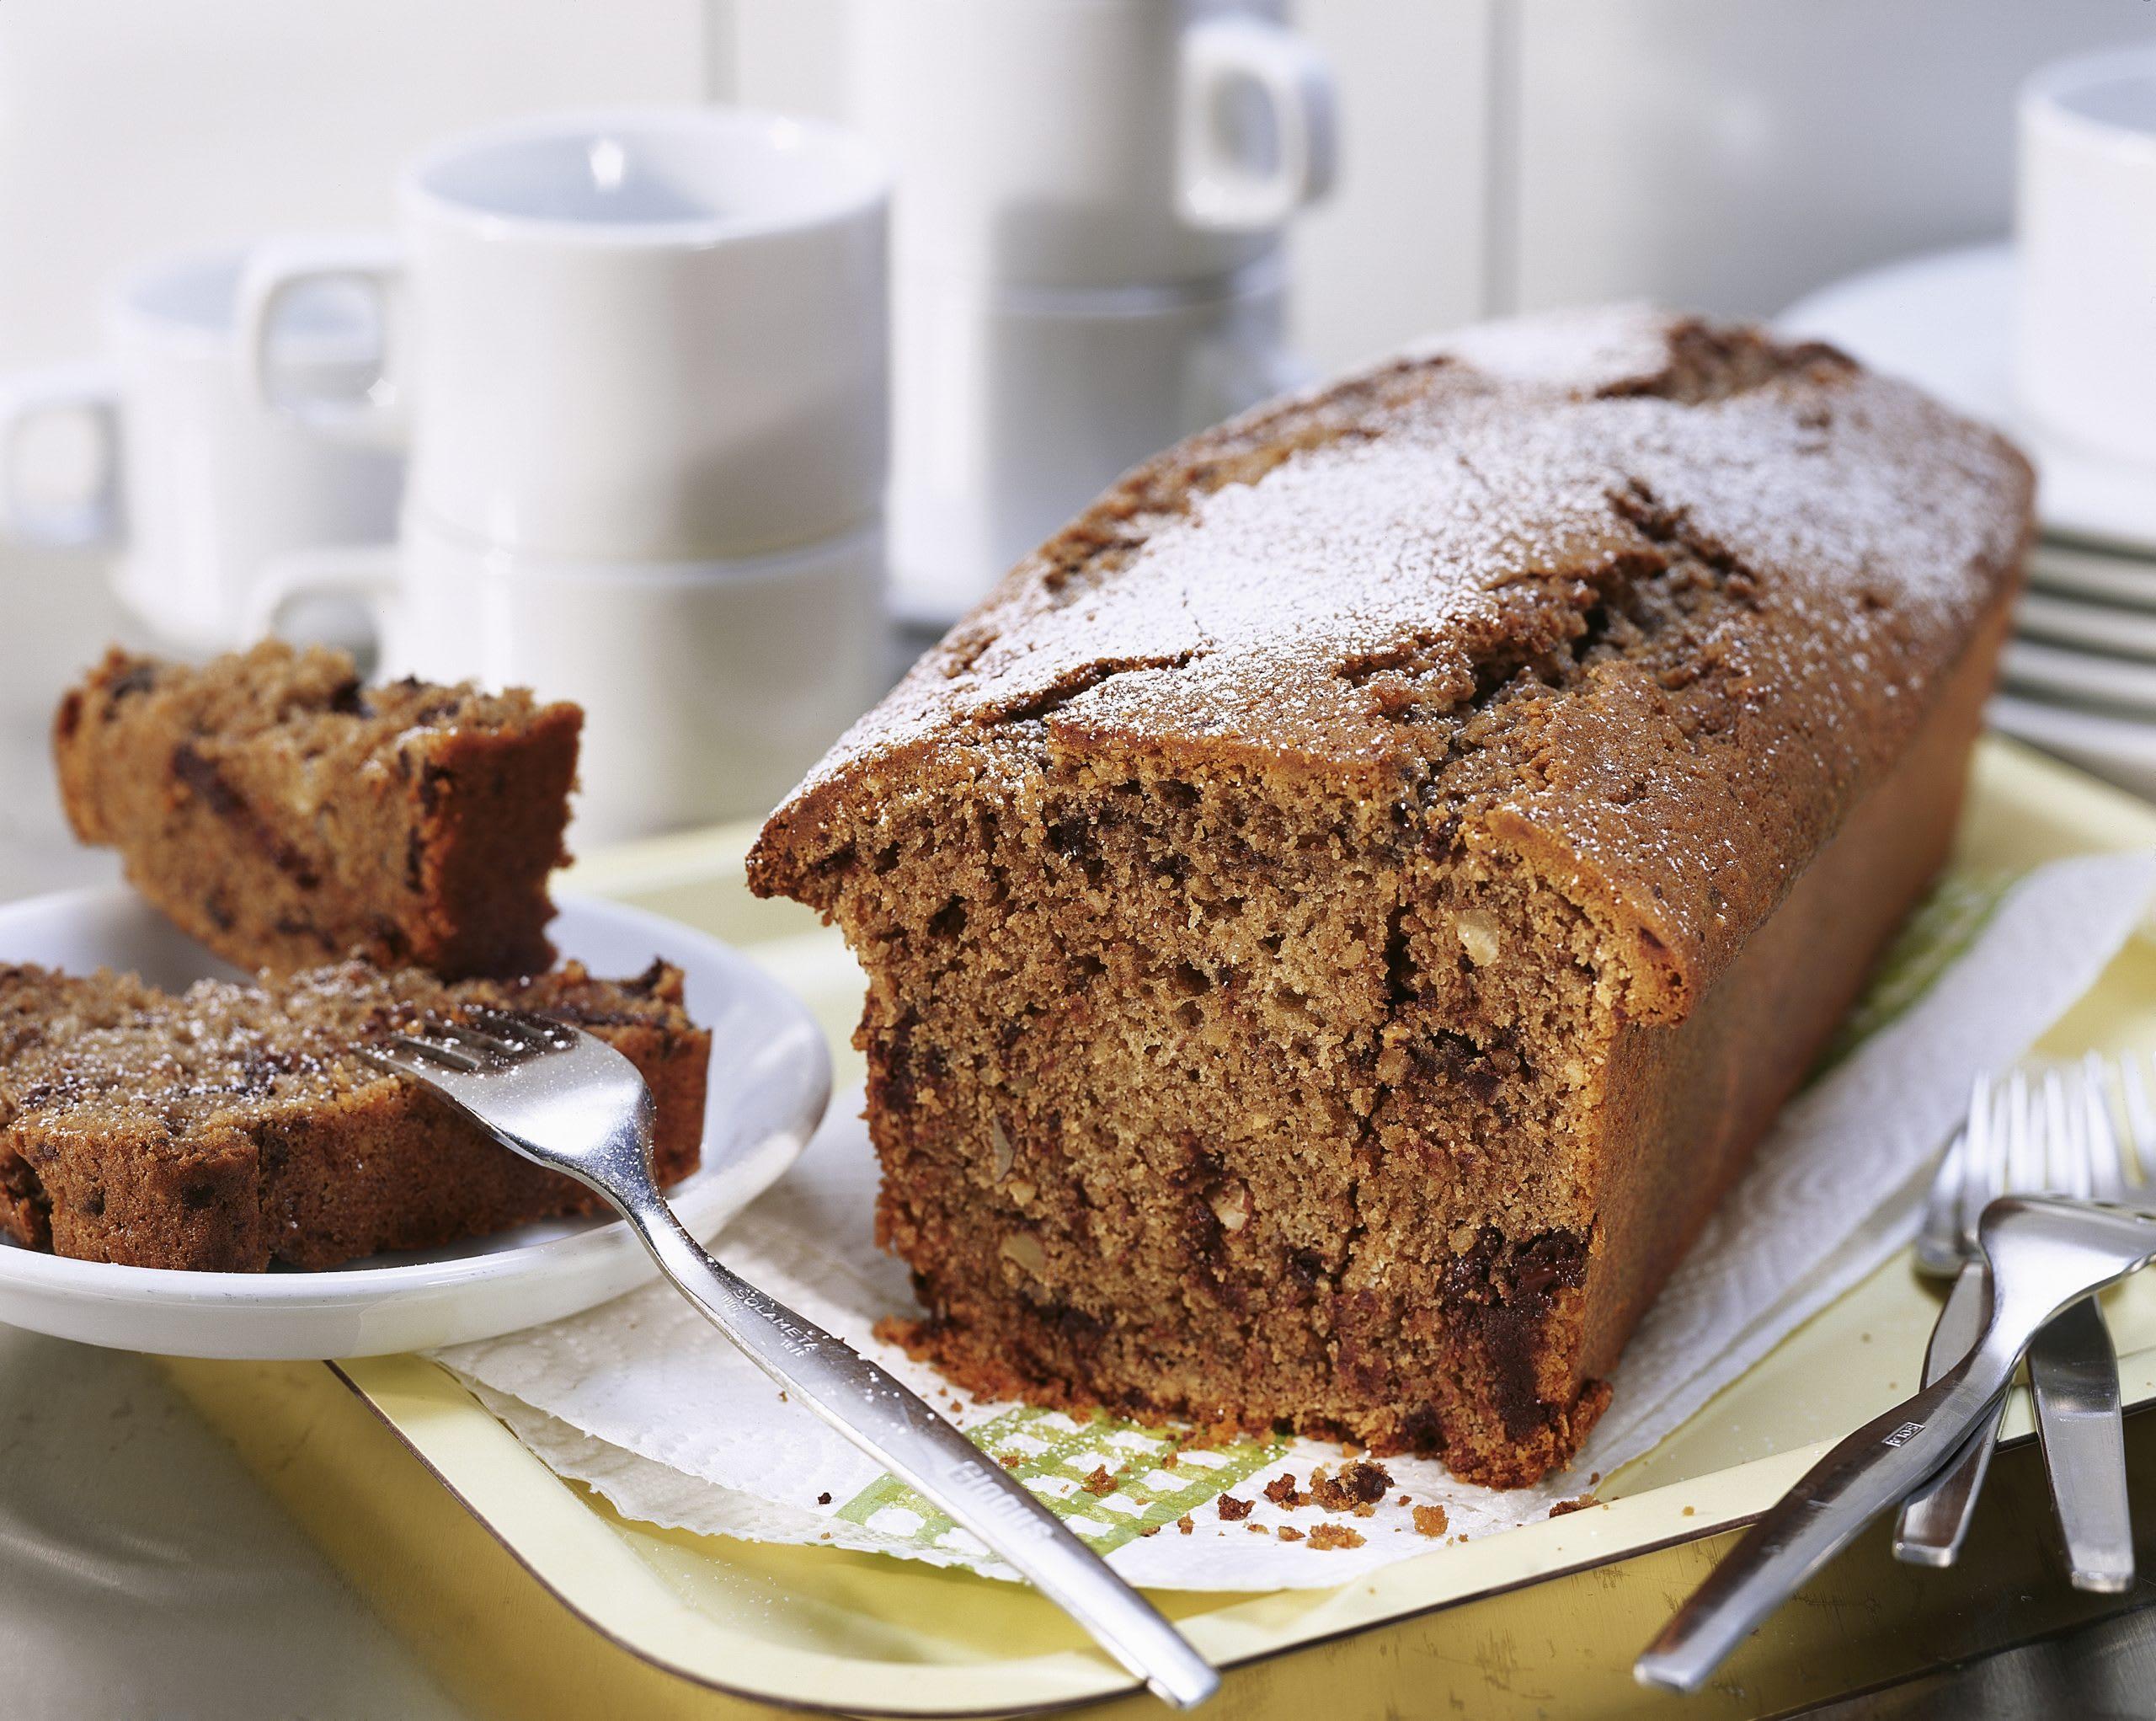 Schokoladen-Mocca-Nuss-Cake